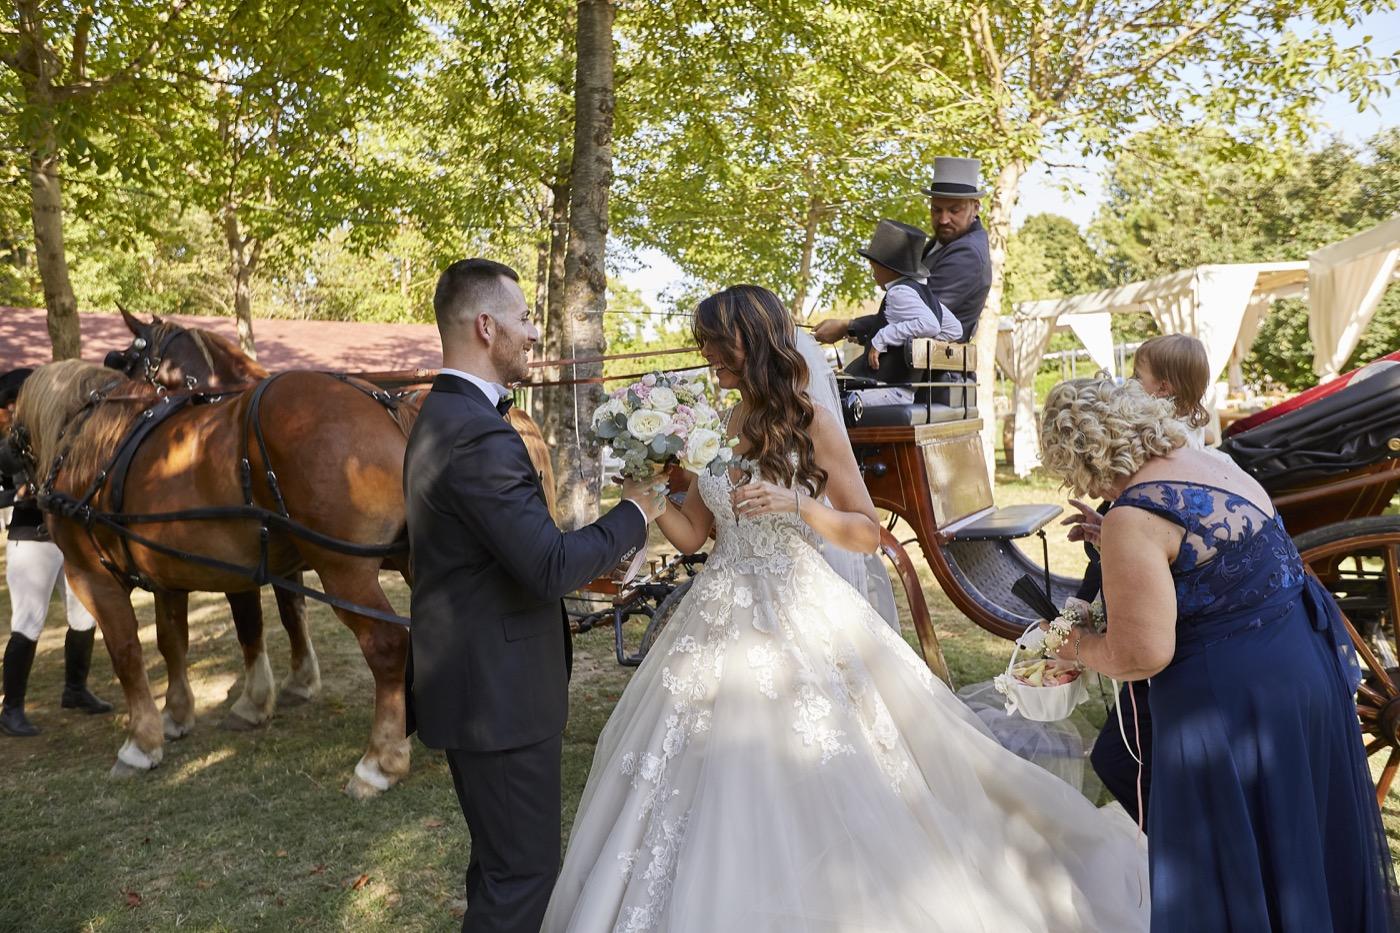 Claudio-Coppola-wedding-photographer-la-scuderia-eventi-preparativi-la-rosetta-perugia-44